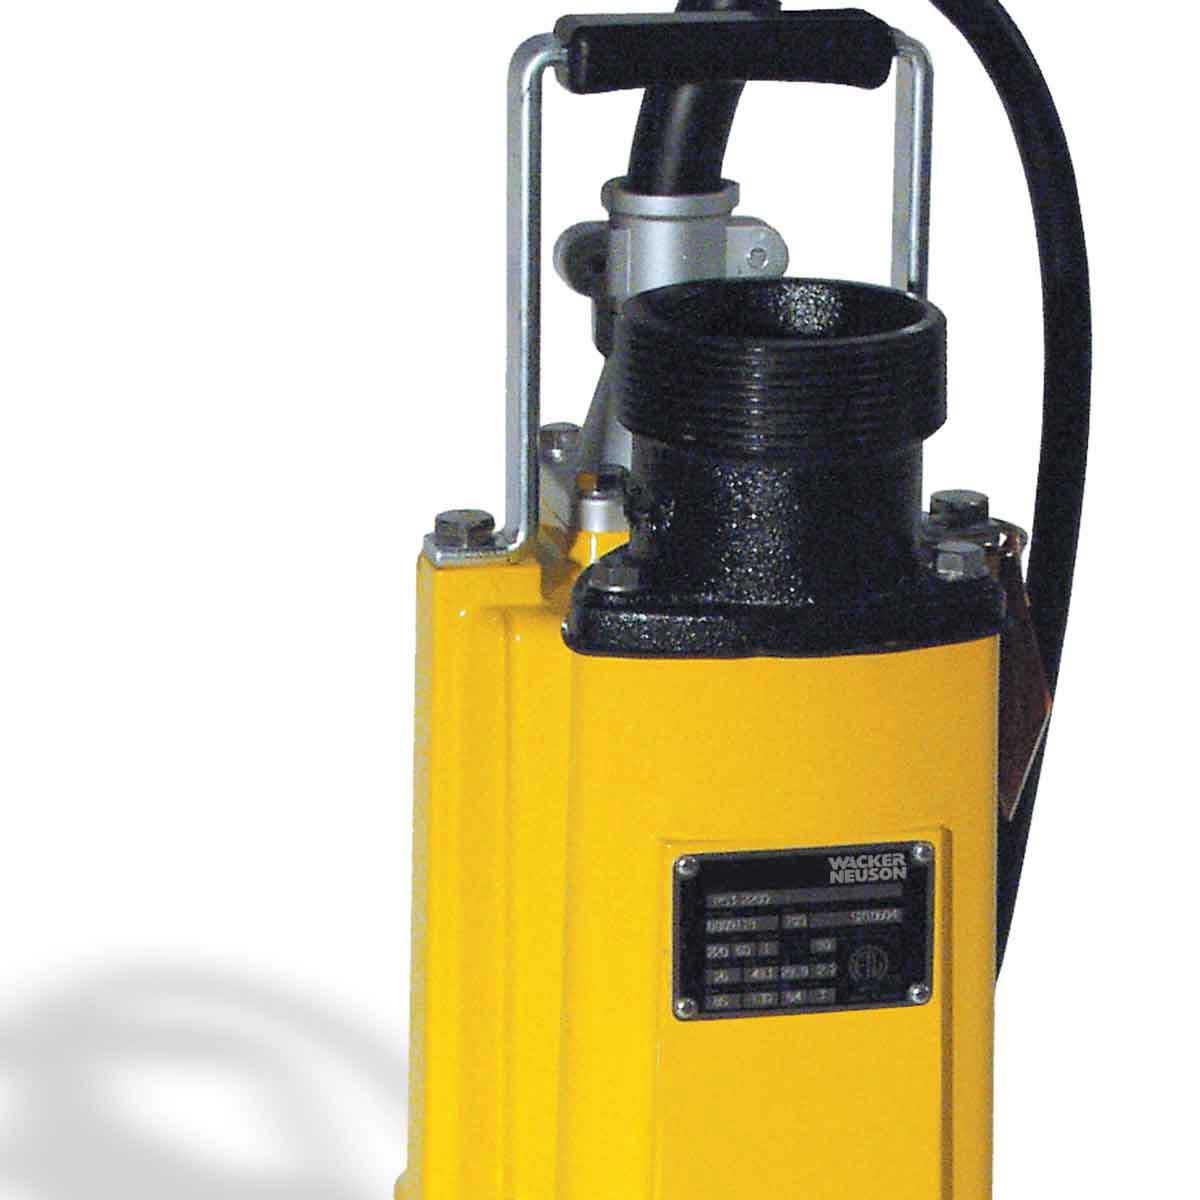 Submersible Pump 220V 3 Phase PS3 Wacker Neuson